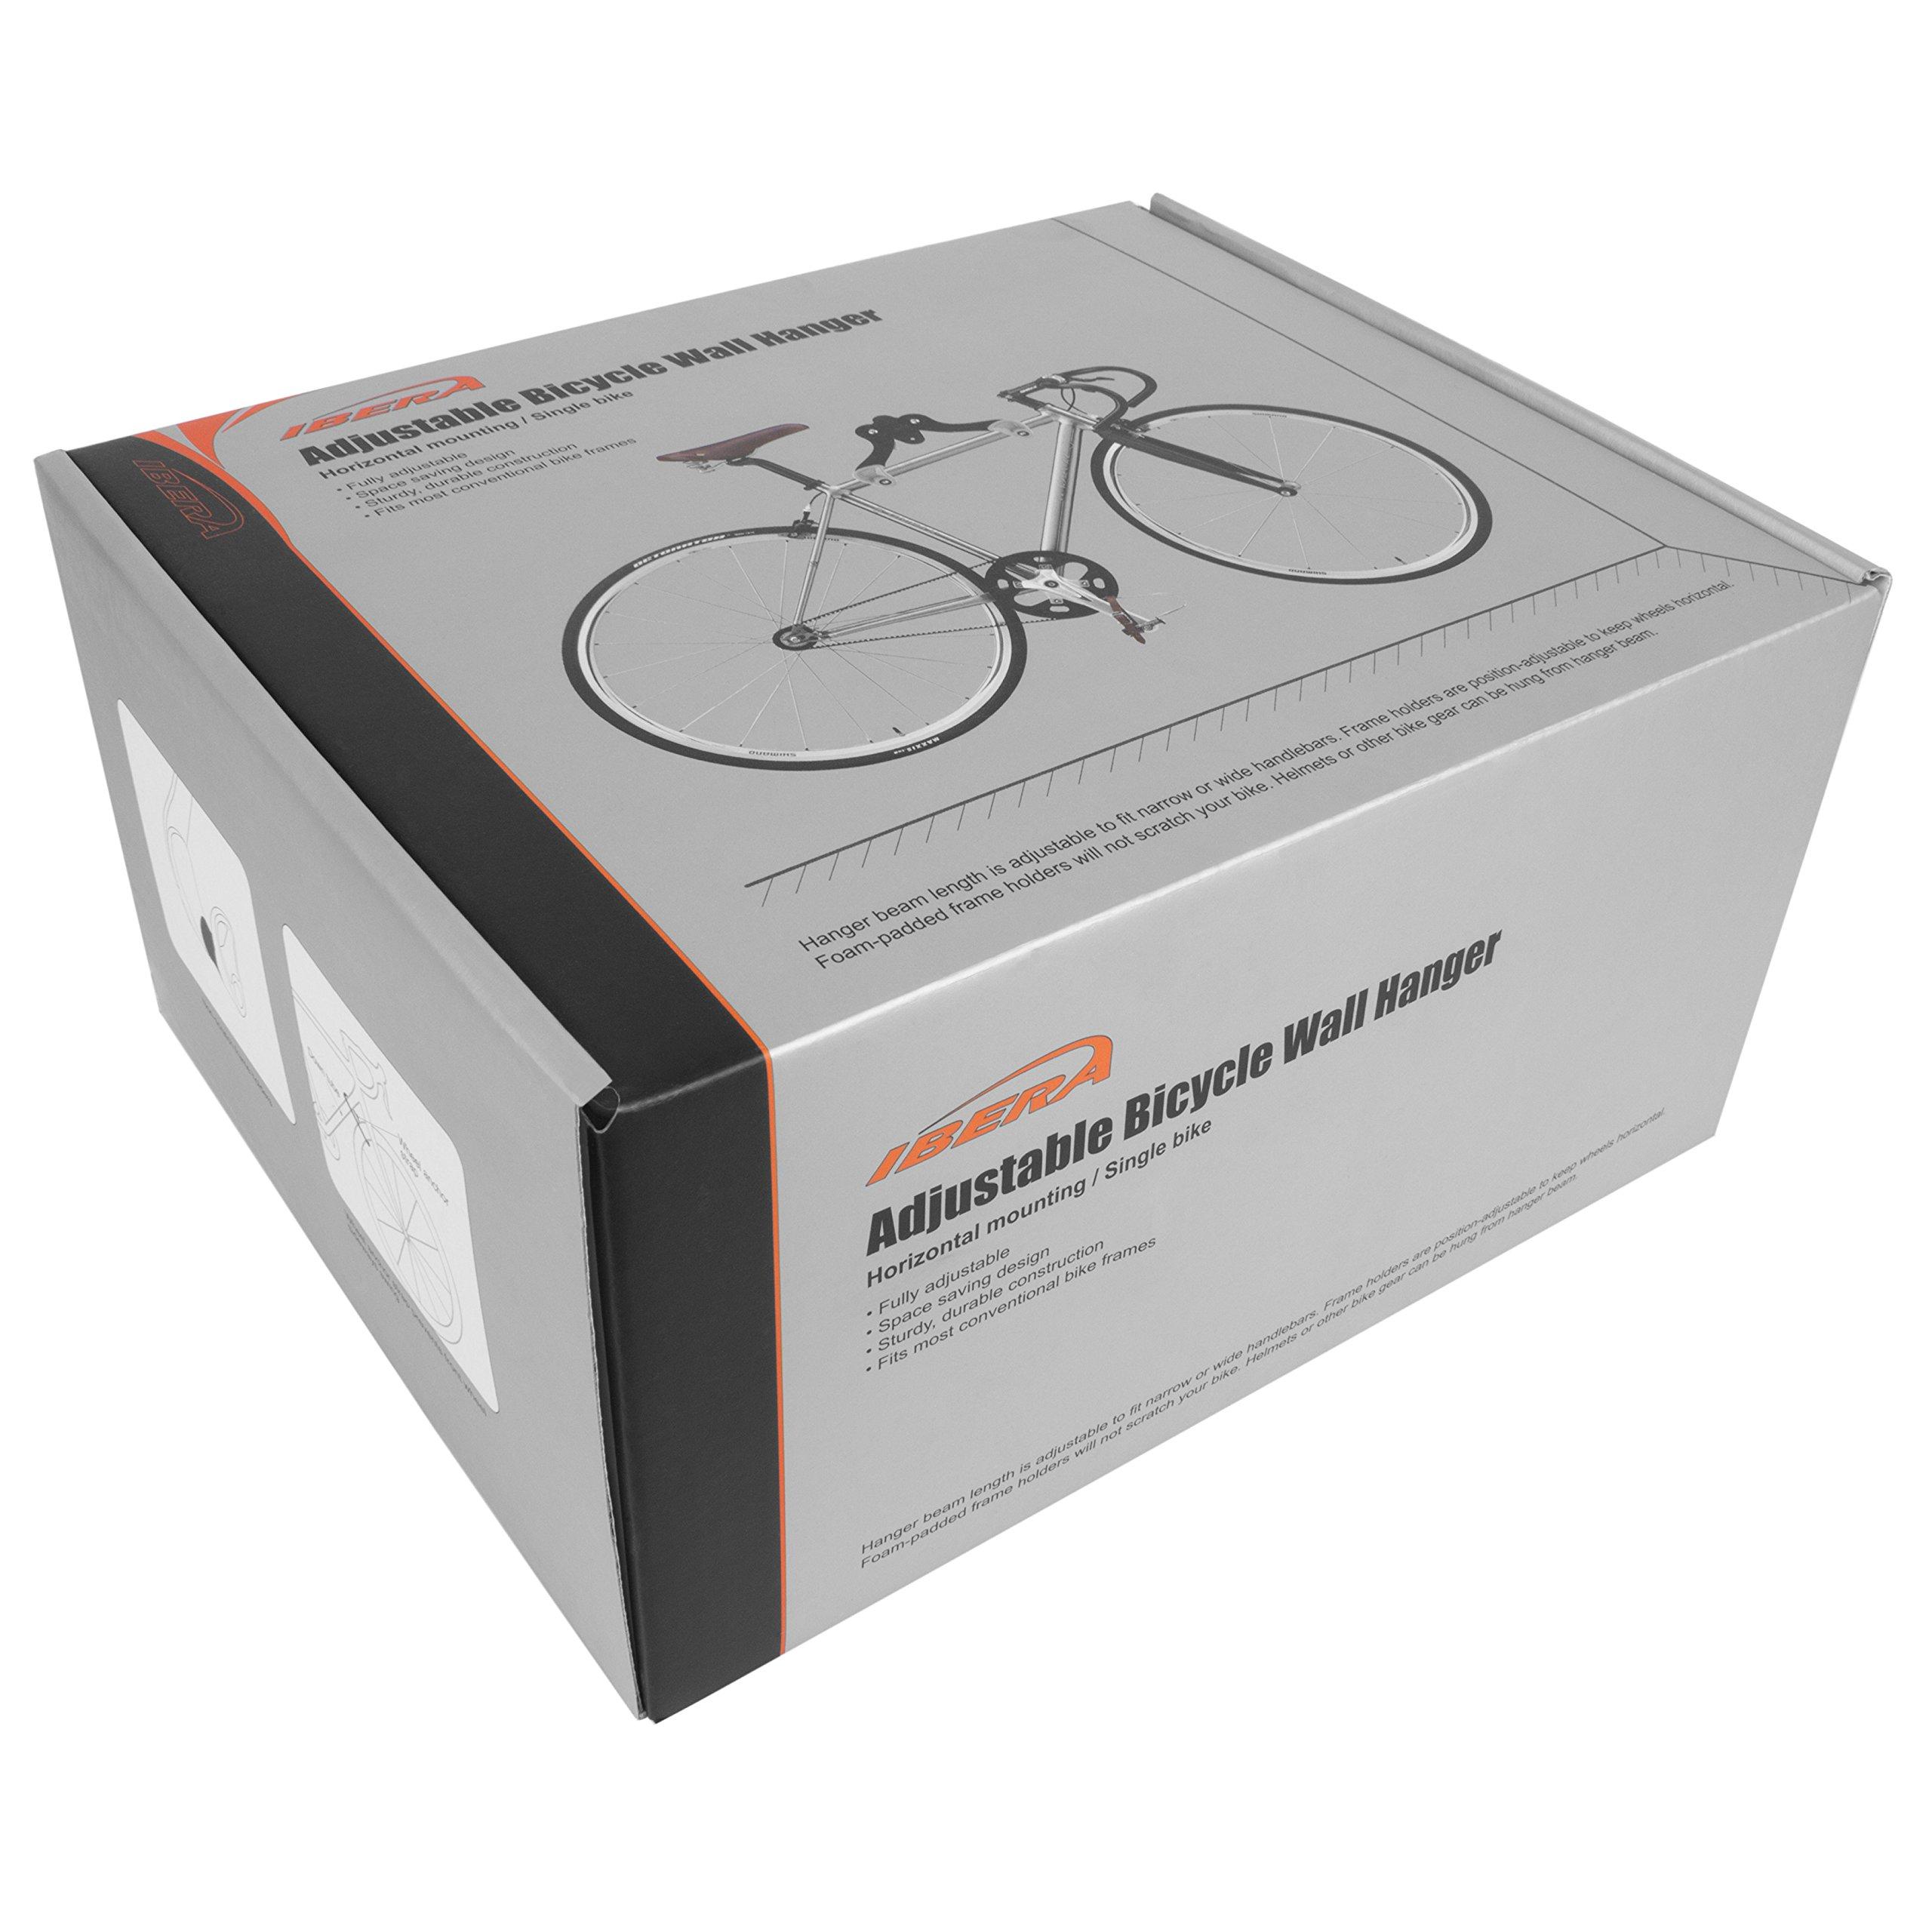 Ibera Horizontal Bicycle Bike Wall Hanger, Bike Hook Holder Storage Rack For Indoor Storage, 45 Degree Adjustable Angle To Keep Your Bike Level by Ibera (Image #8)